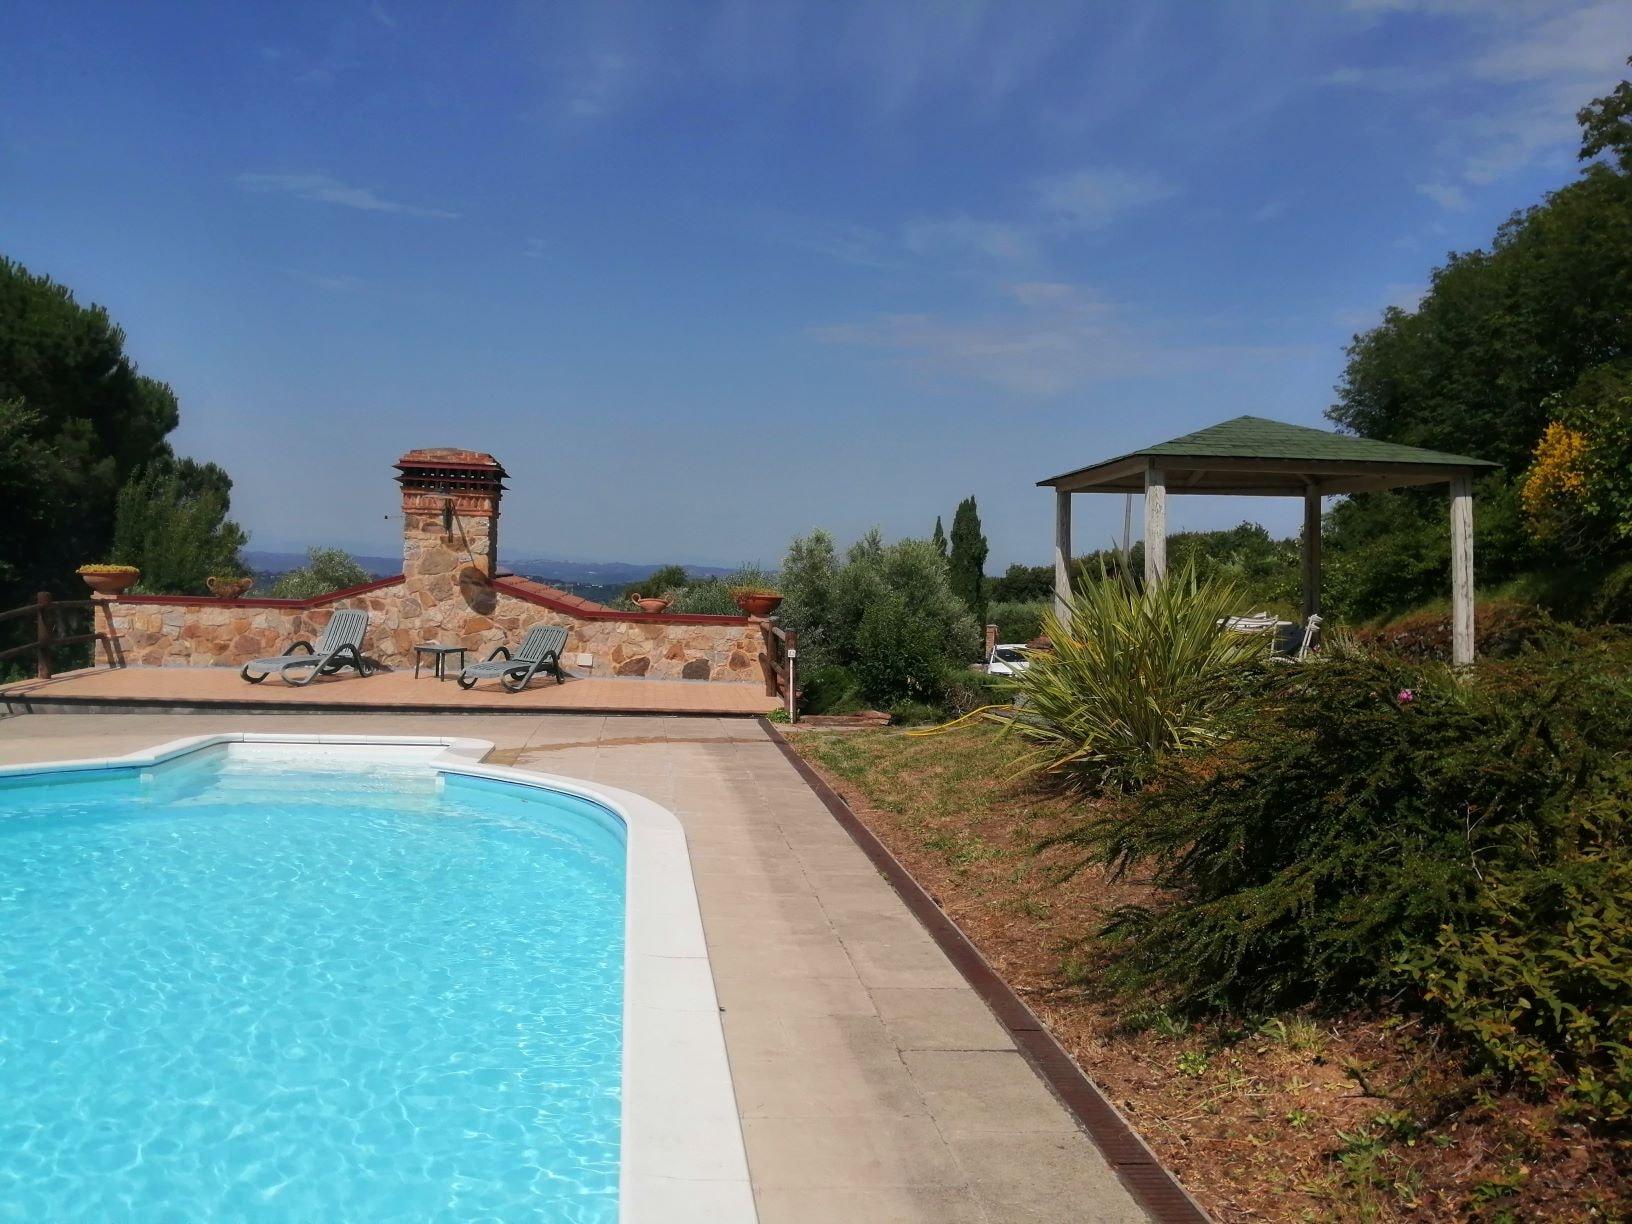 ferienhaus, toskana mit privatem Pool